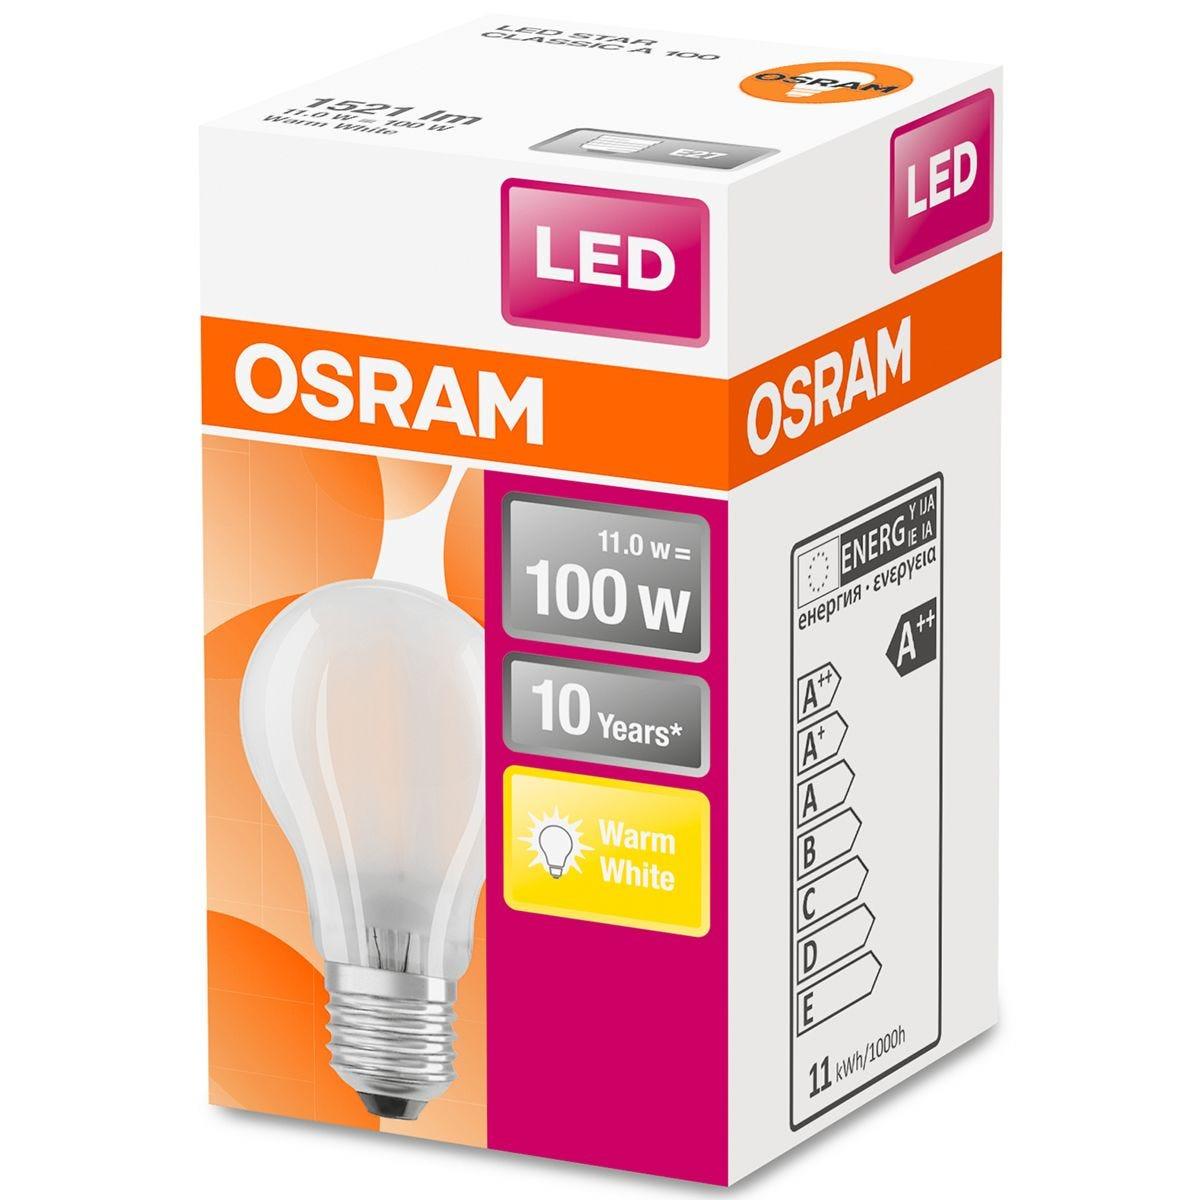 Osram Classic A 100W LED Filament Frosted ES Bulb